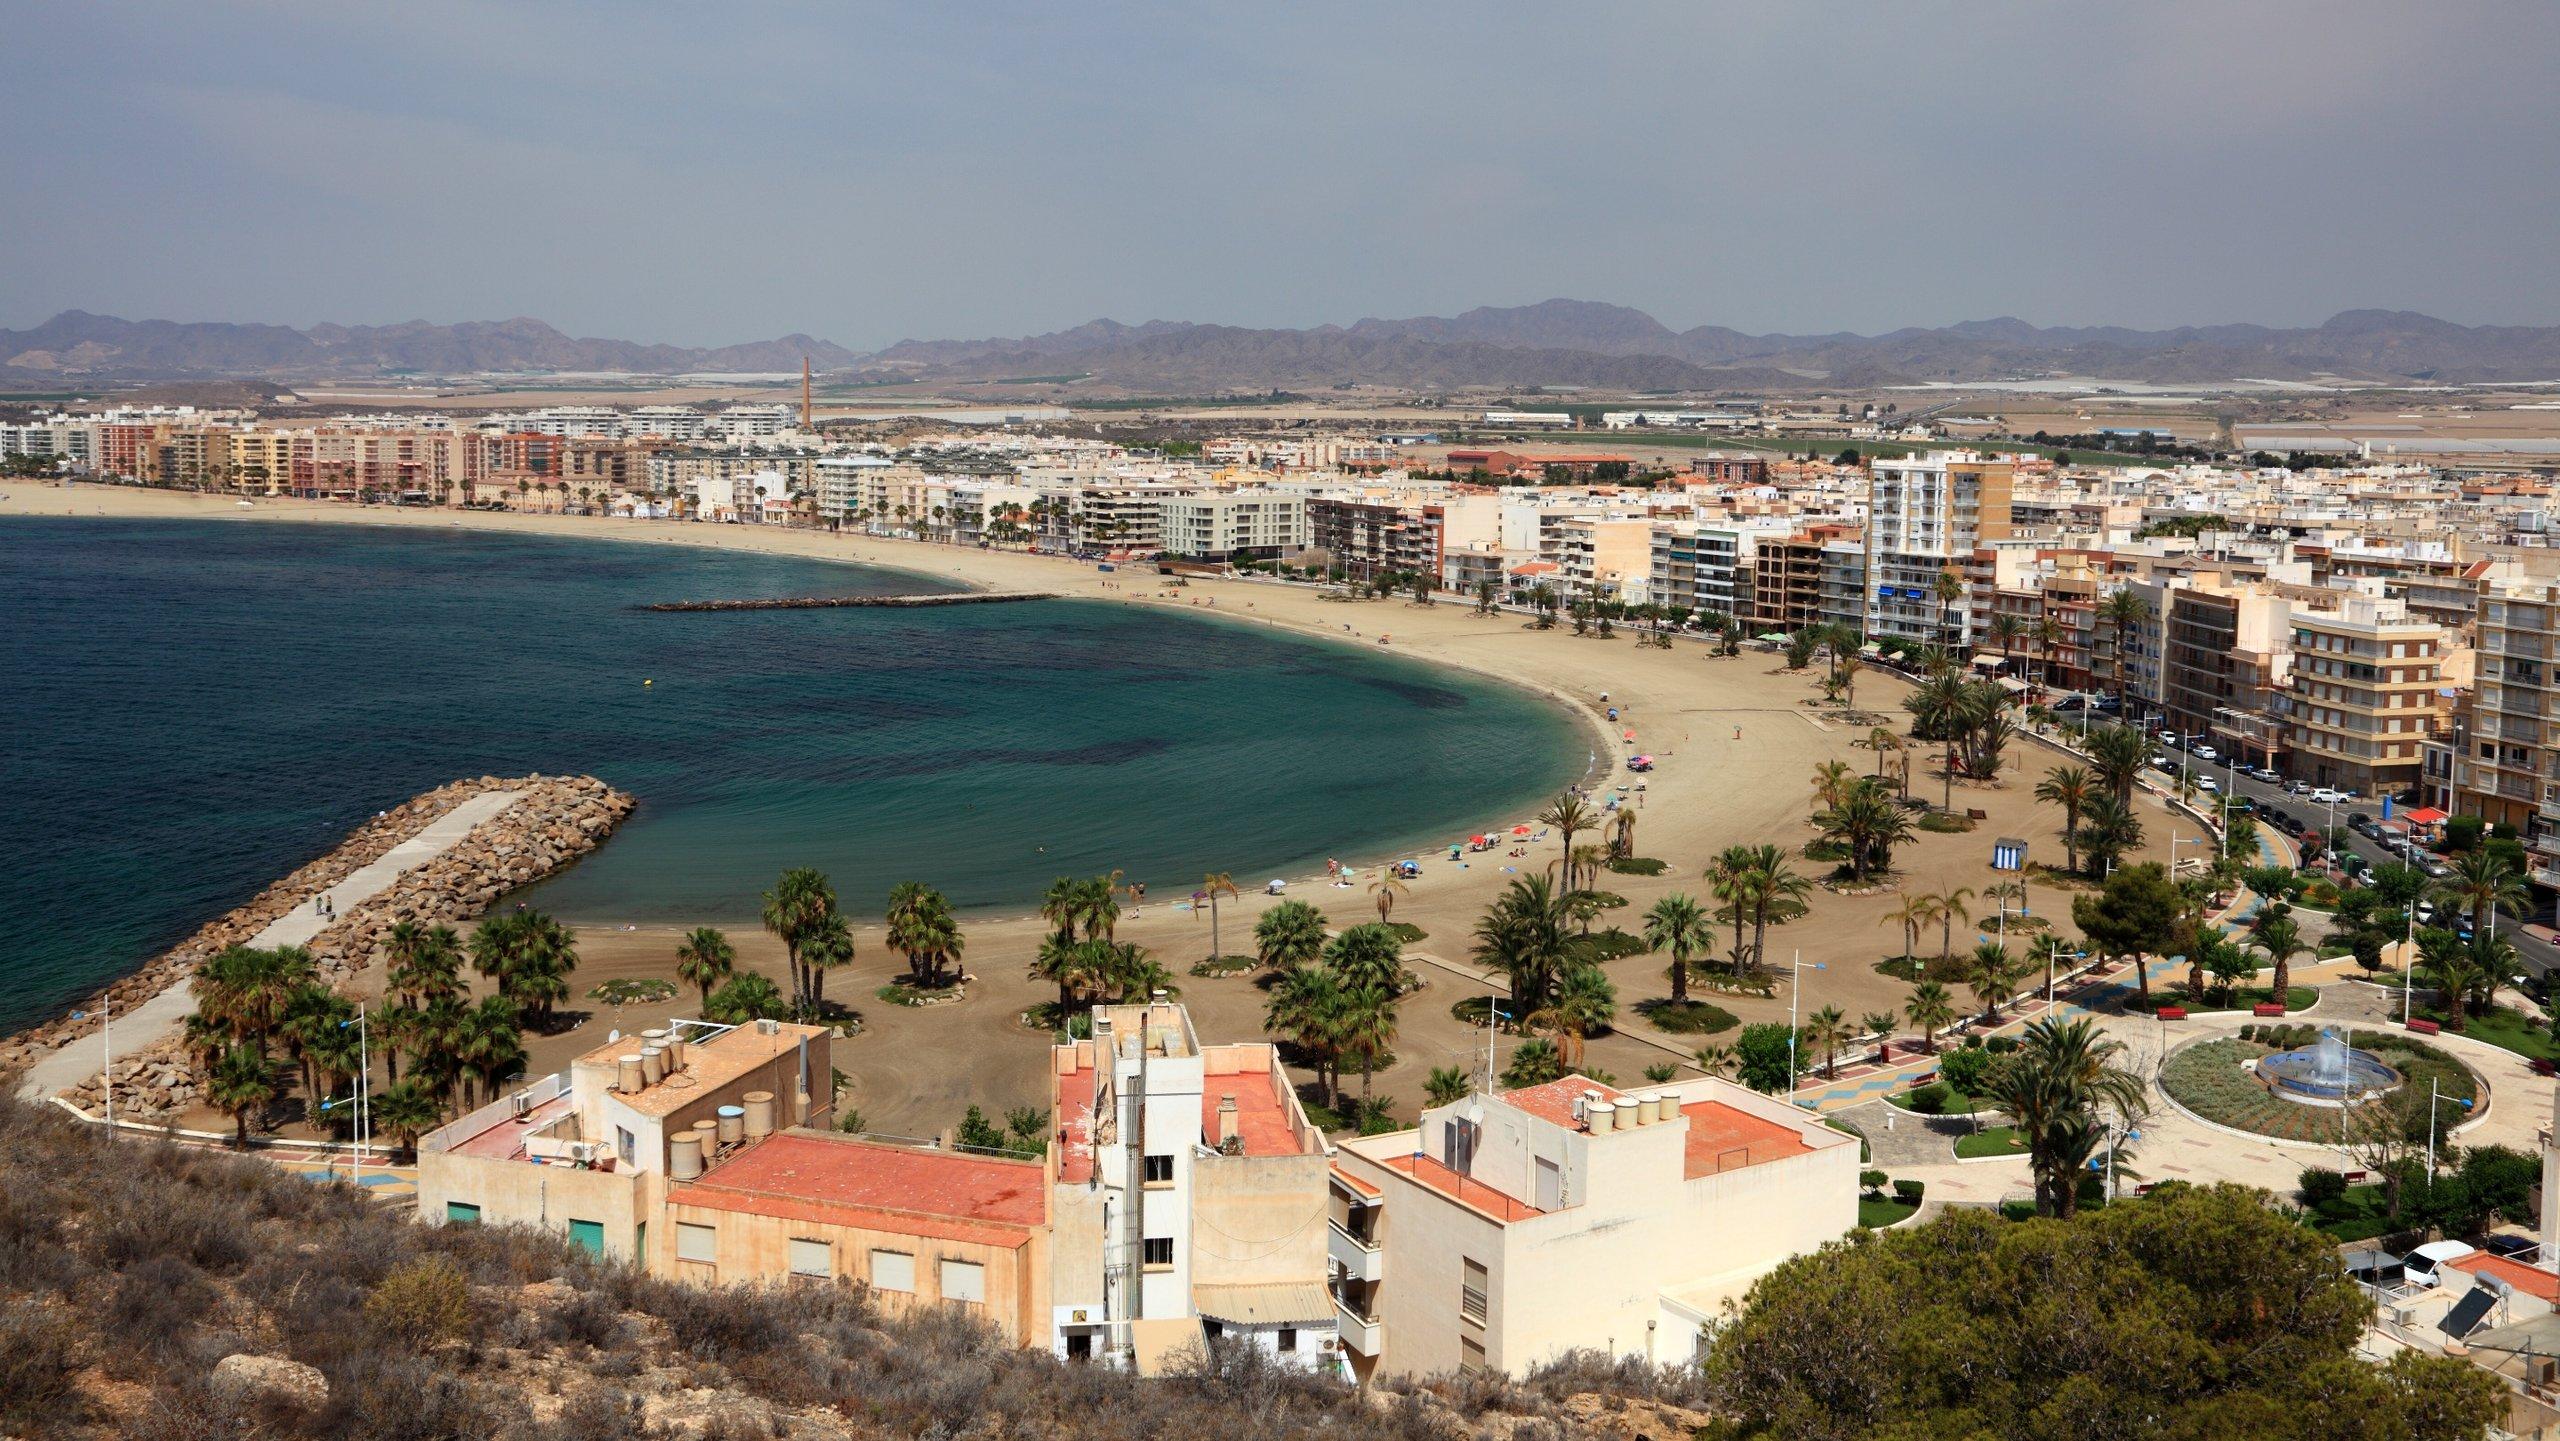 Huerta de Murcia, Murcia (regione), Spagna